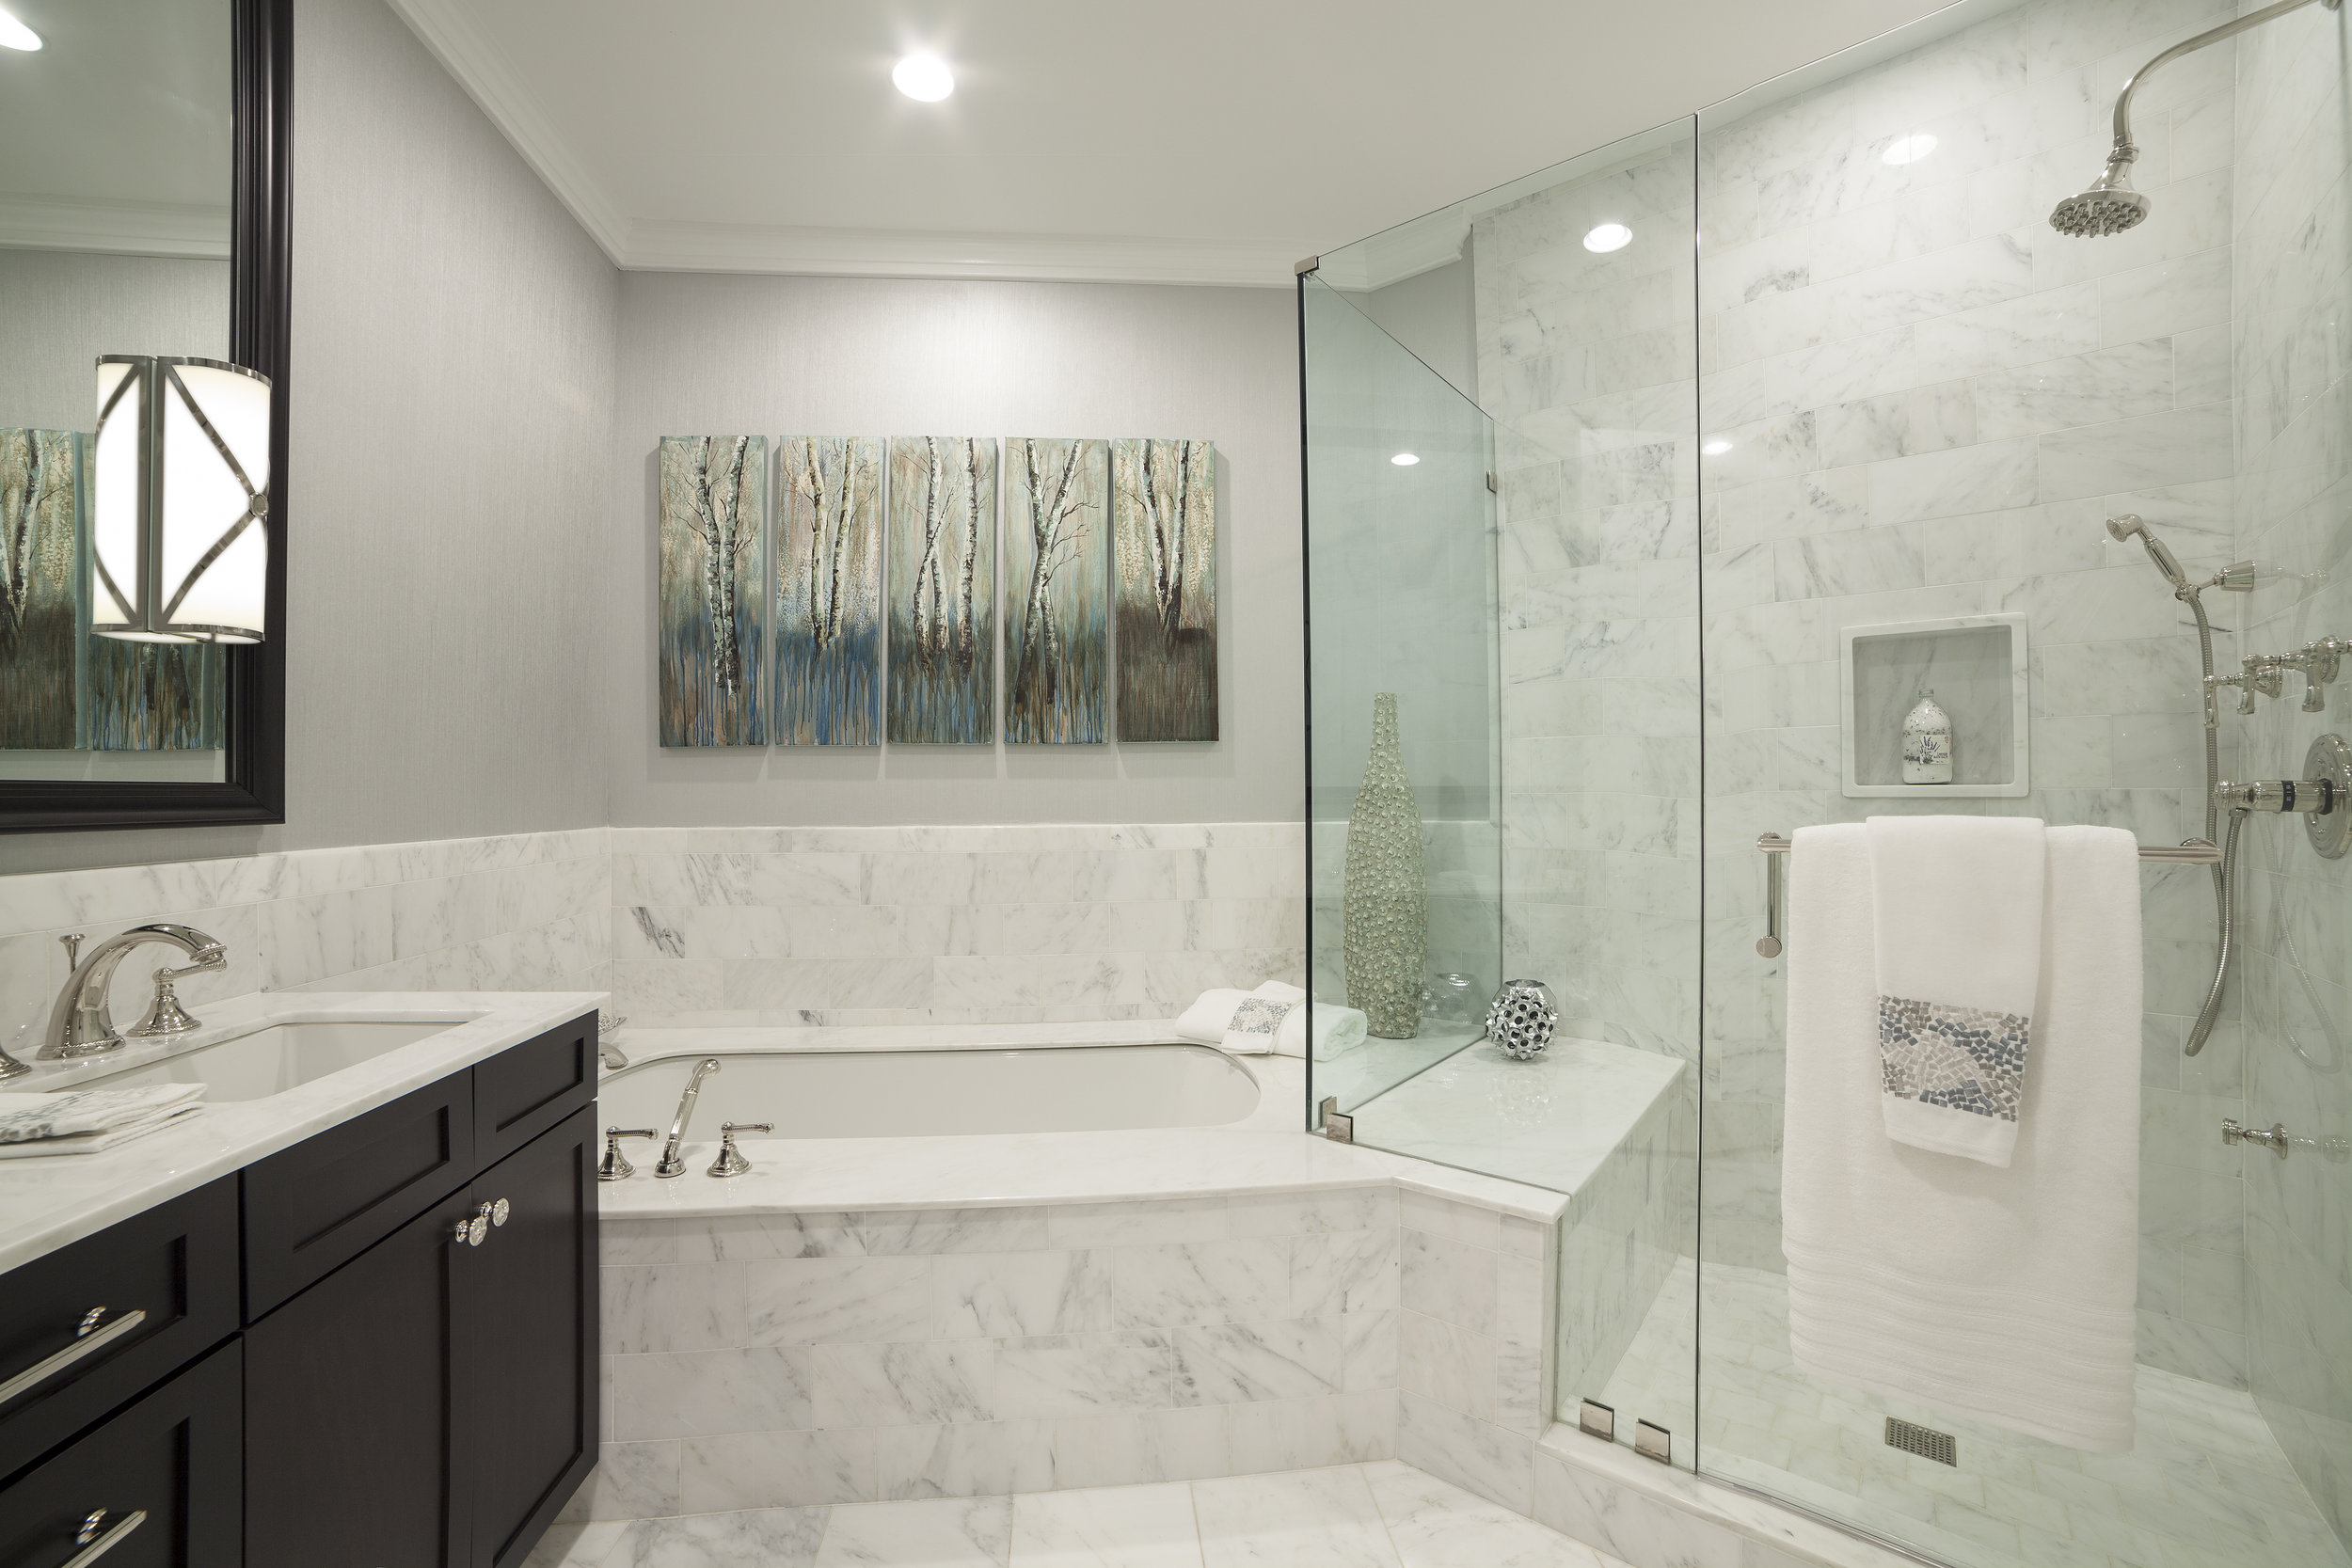 modern style bathroom with bathtub, shower and sink